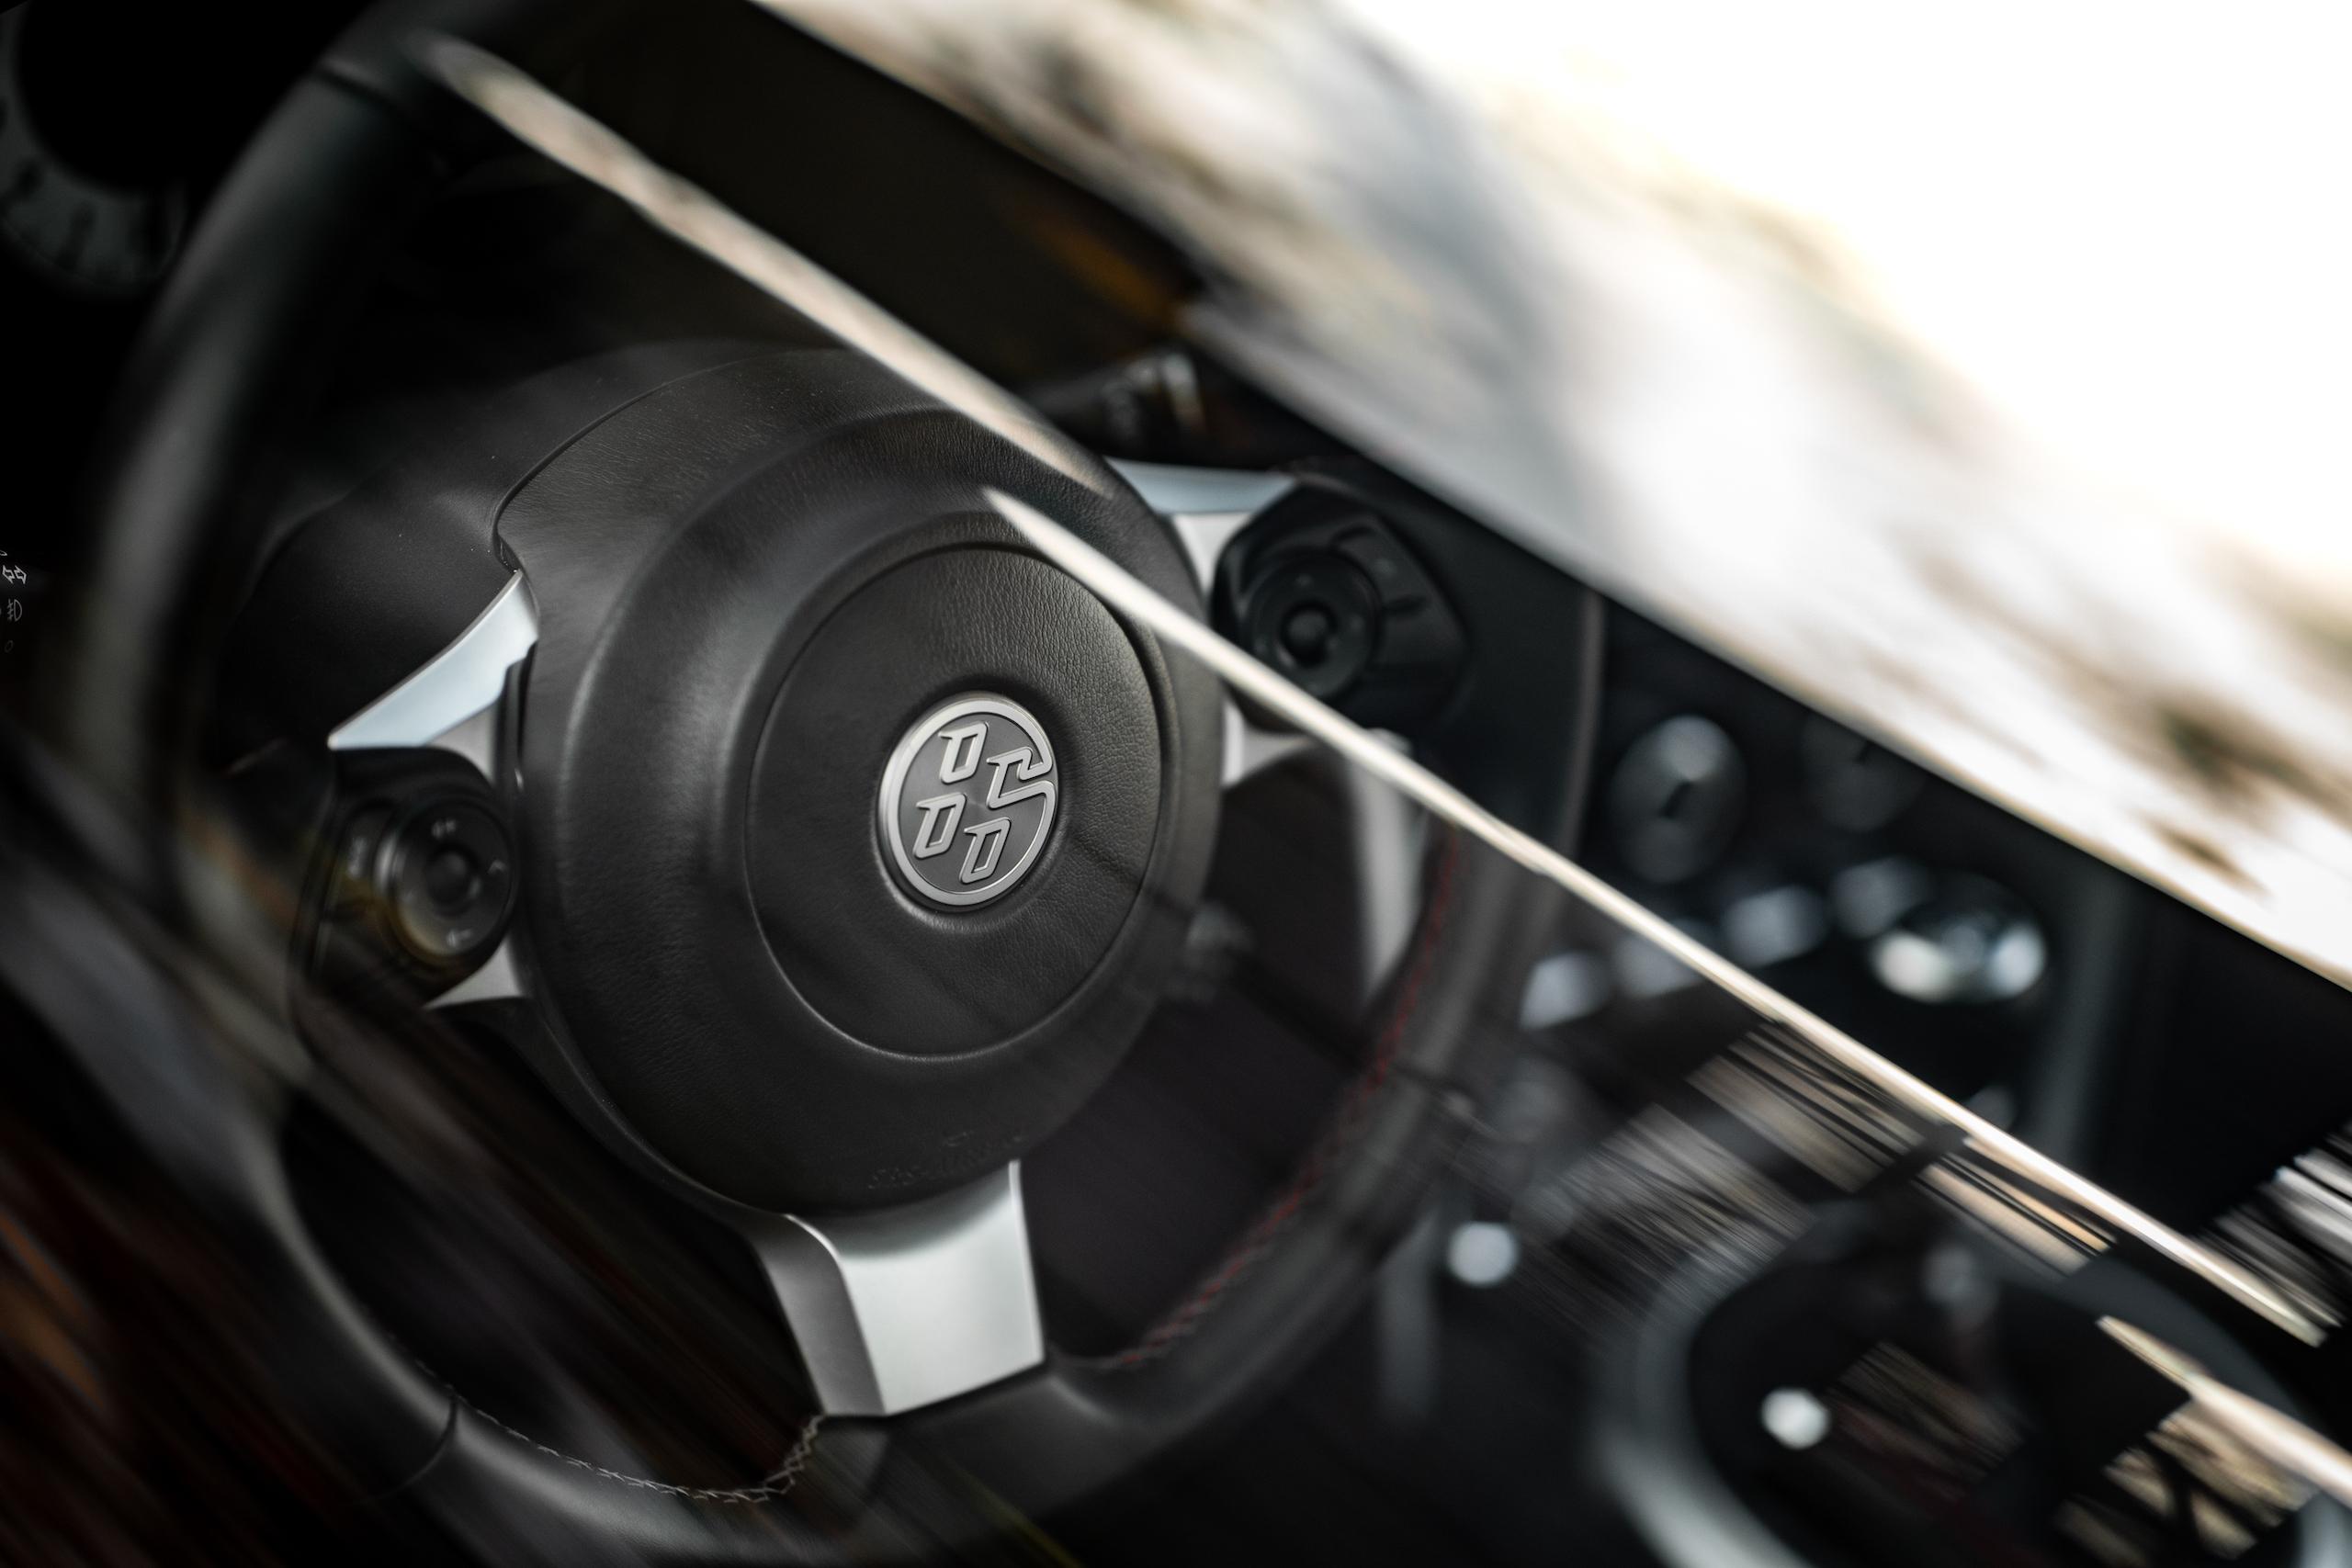 2020 Toyota 86 GT steering wheel detail through glass